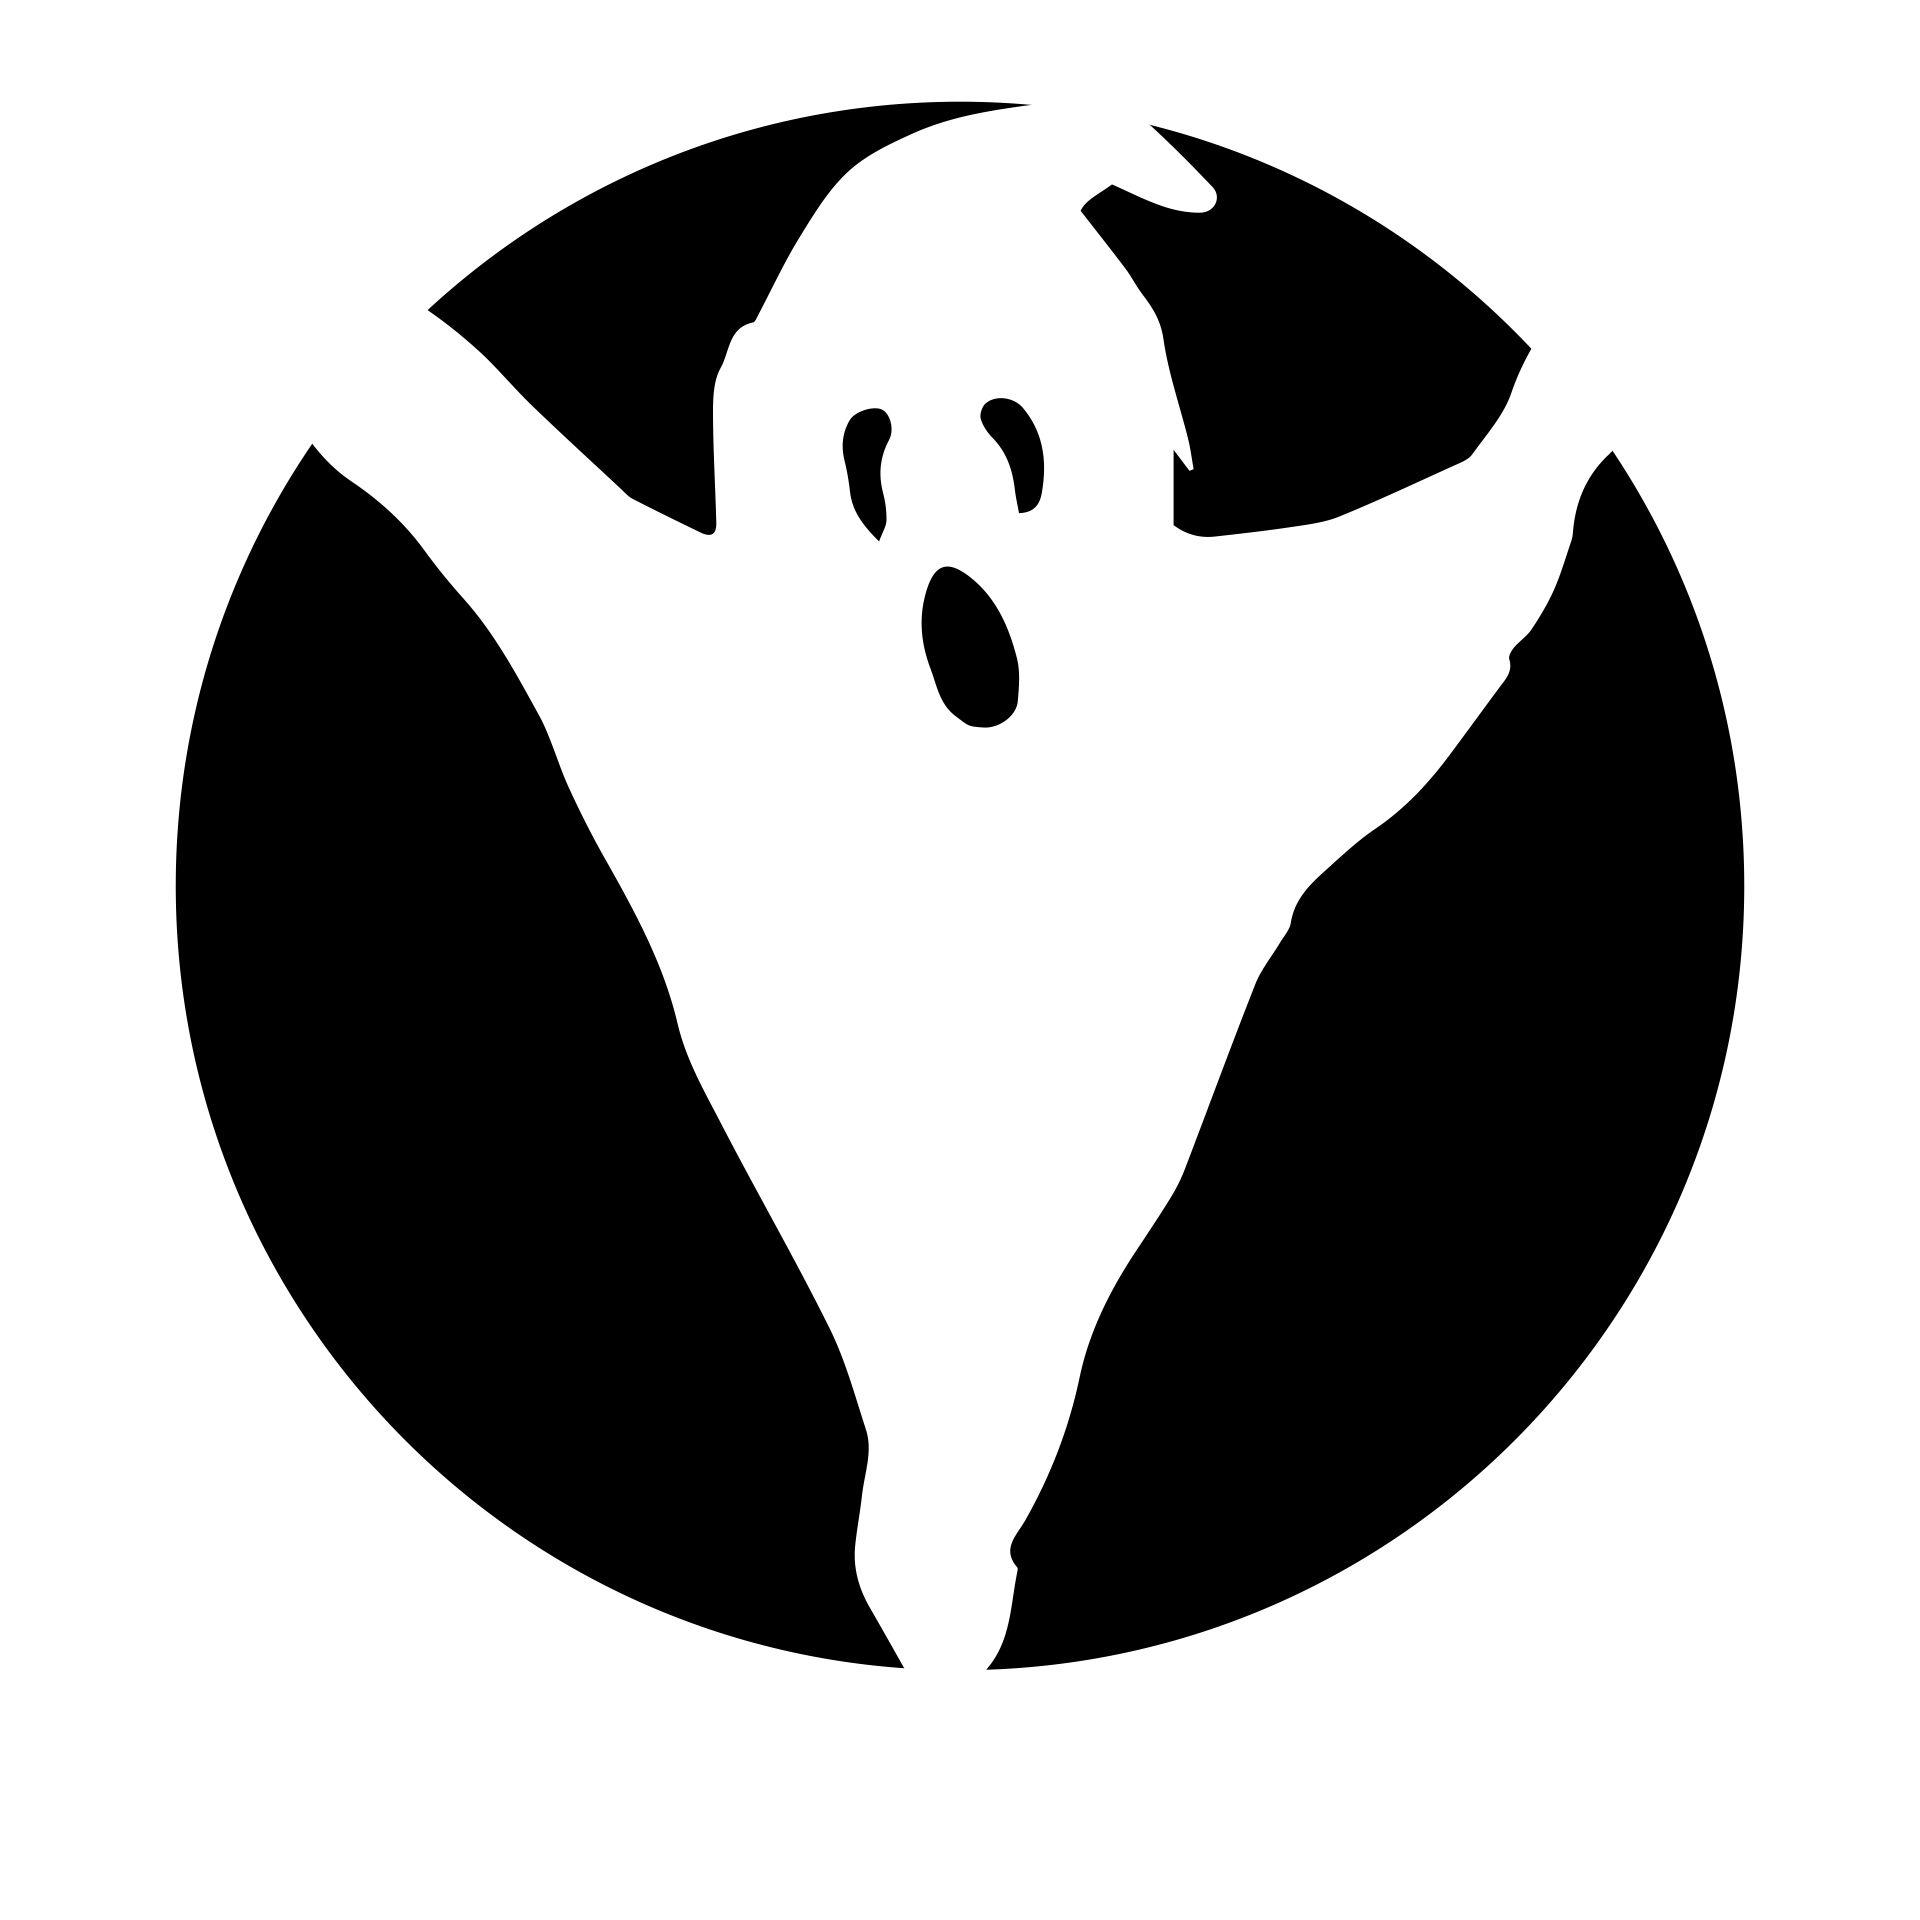 Ghost Pumpkin Carving Stencils Templates